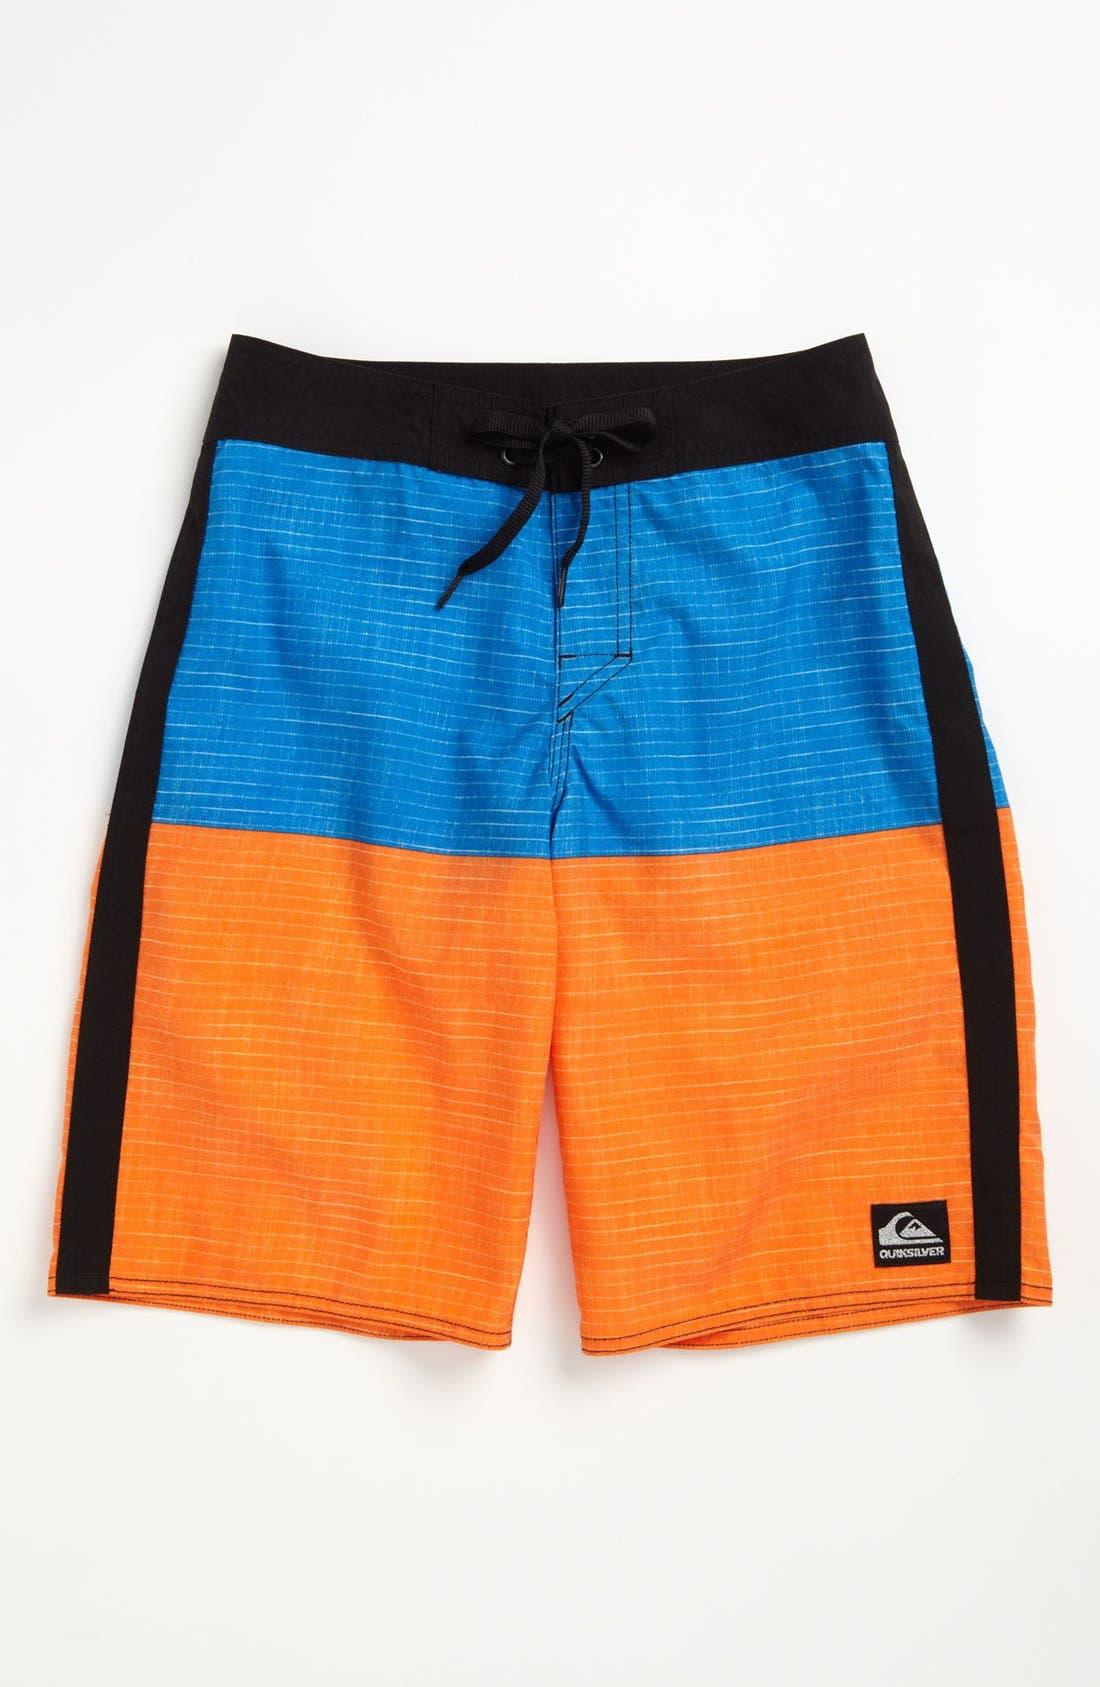 Alternate Image 1 Selected - Quiksilver Colorblock Board Shorts (Big Boys)